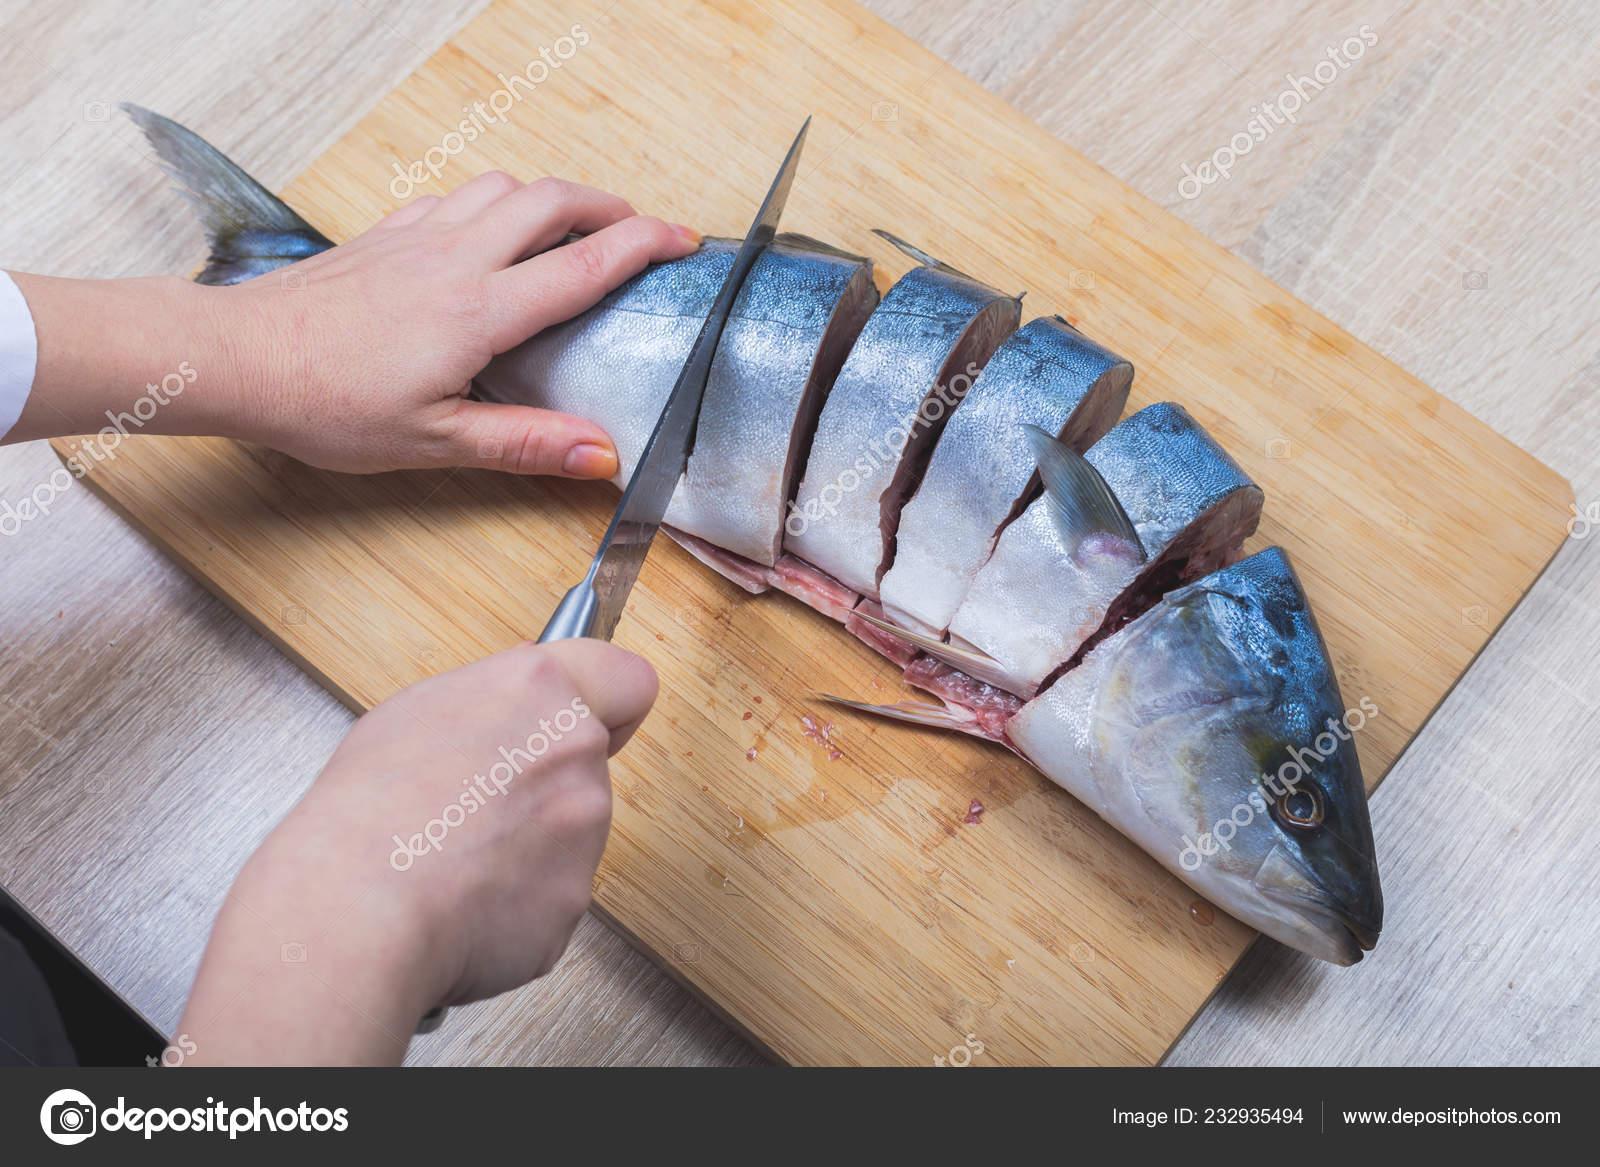 Cook Cuts Raw Tuna Fish Hands Closeup Stock Photo C Ld1012lsk Gmail Com 232935494